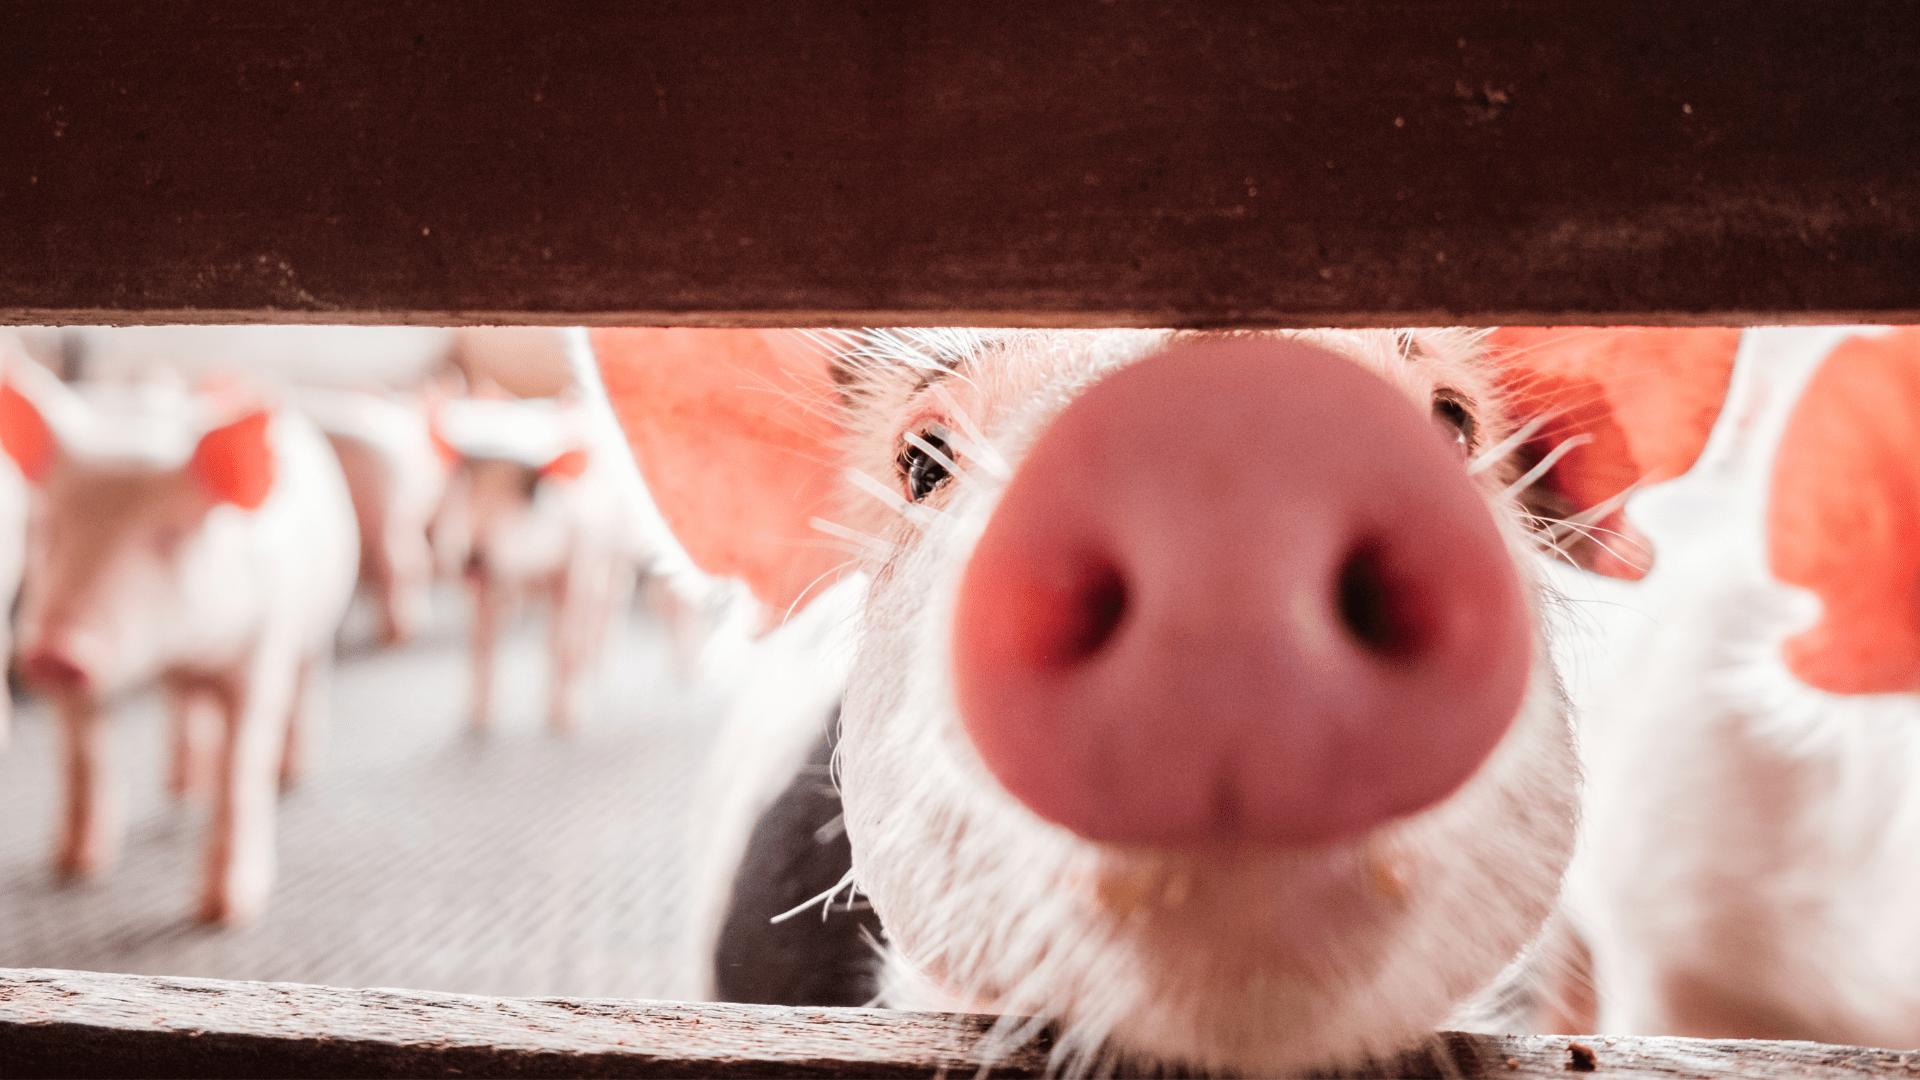 Animal Welfare – Swine Farming